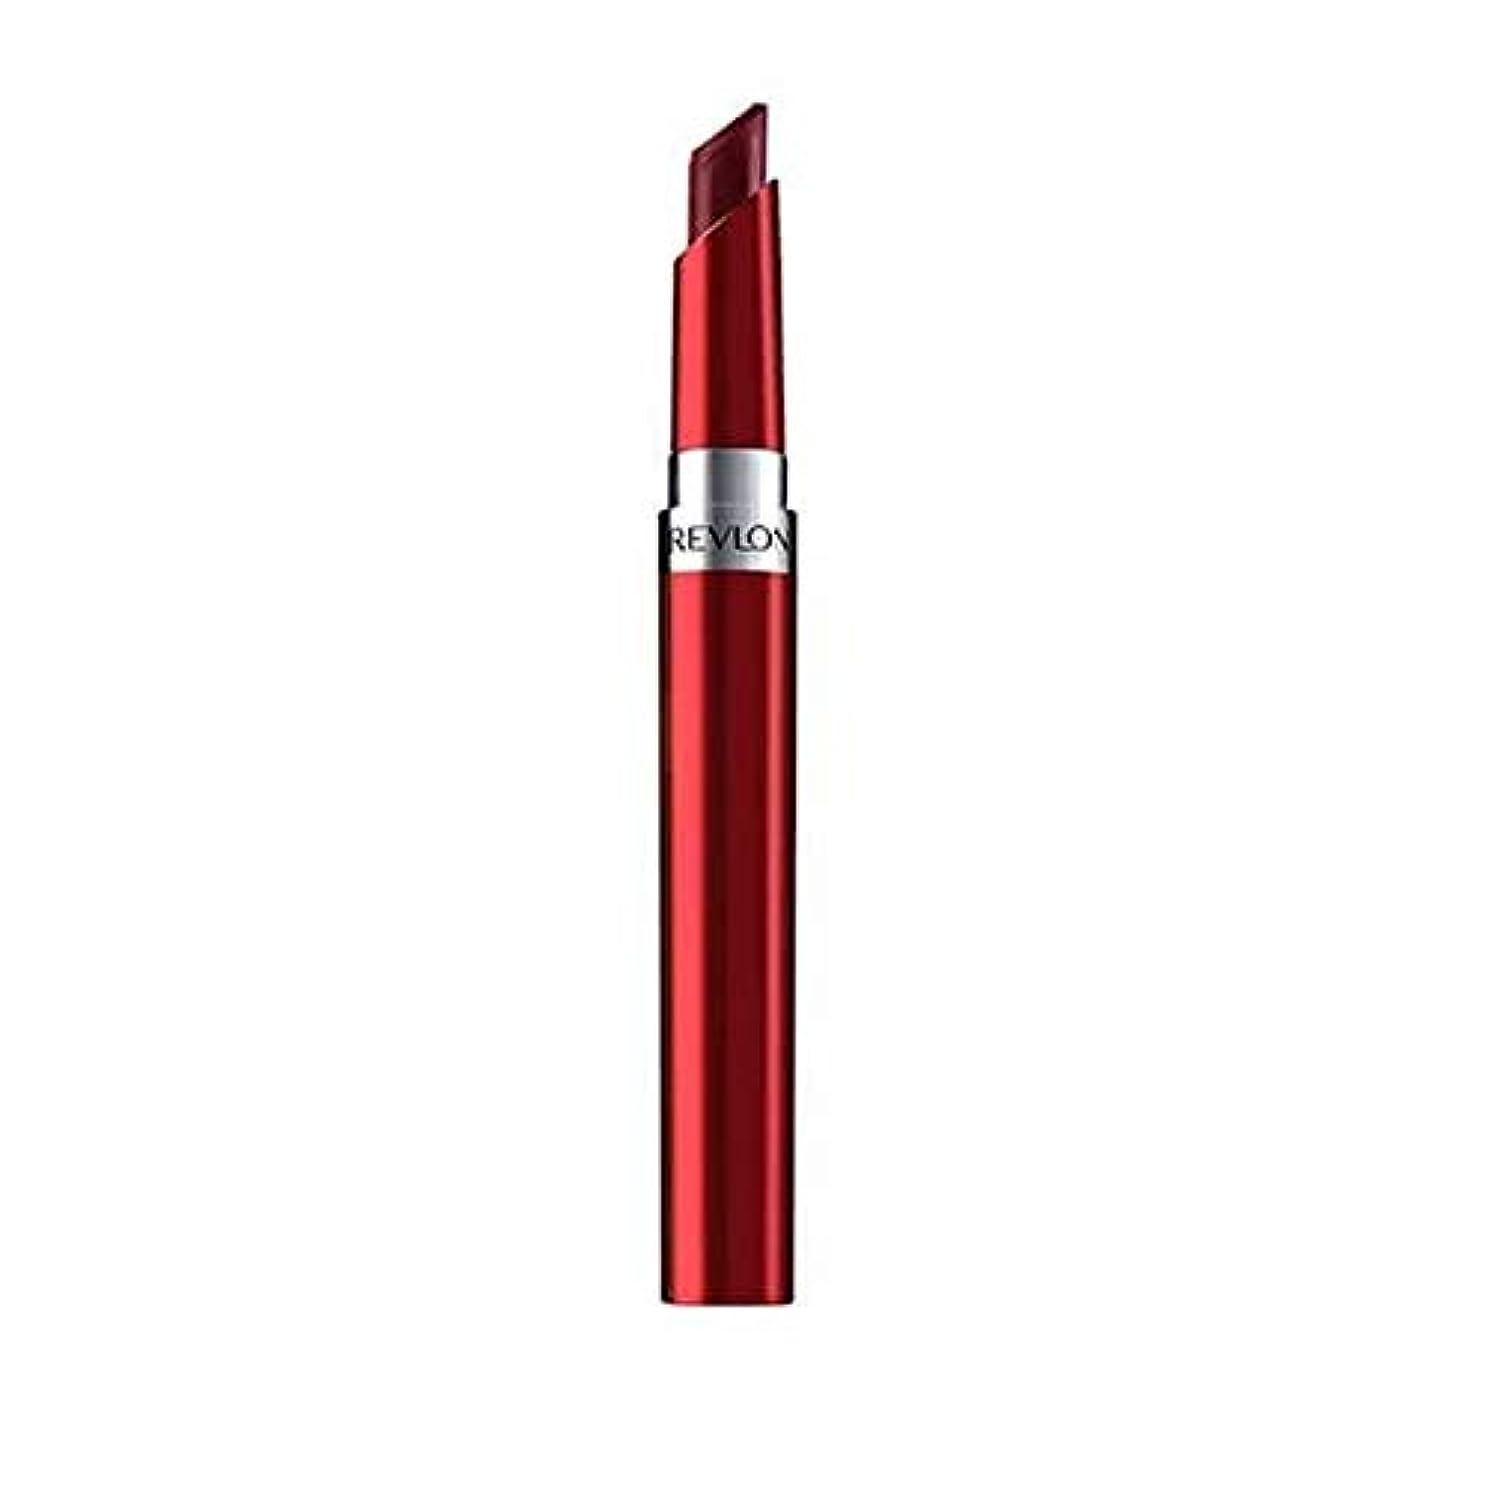 [Revlon ] レブロン超HdゲルLipcolorアドビ - Revlon Ultra HD Gel Lipcolor Adobe [並行輸入品]